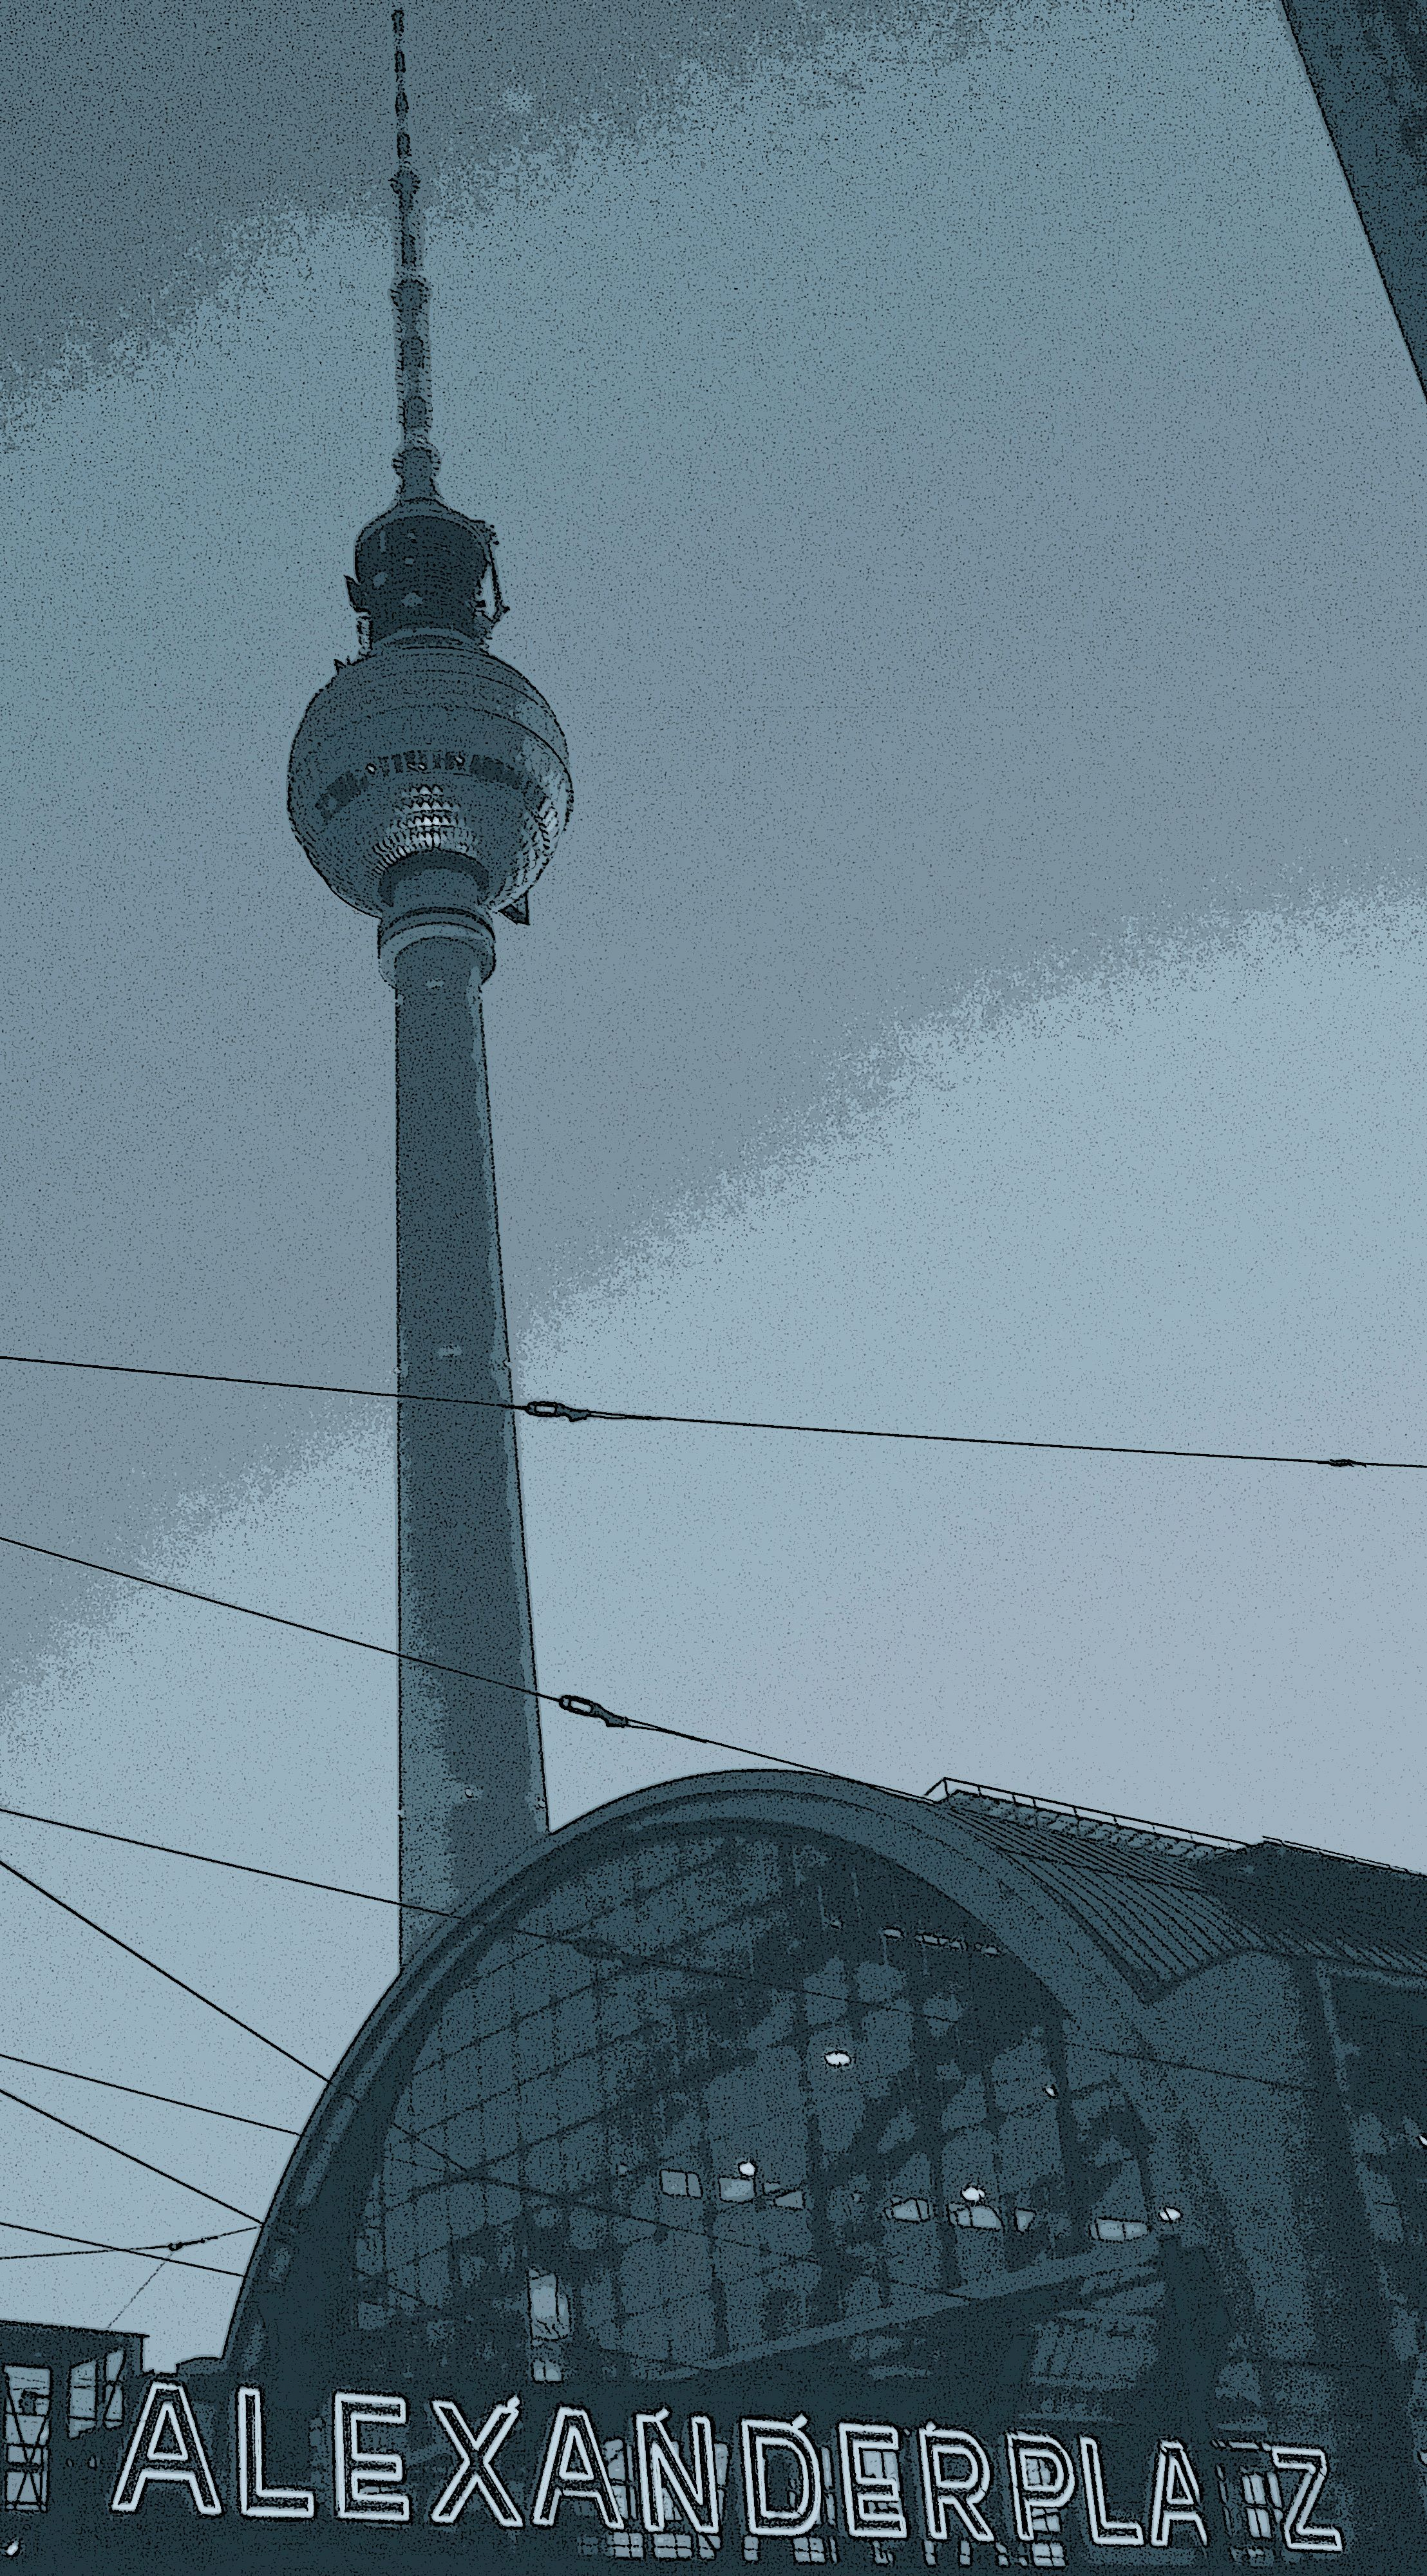 Berlin Alexanderplatz Photo Tower Landmarks